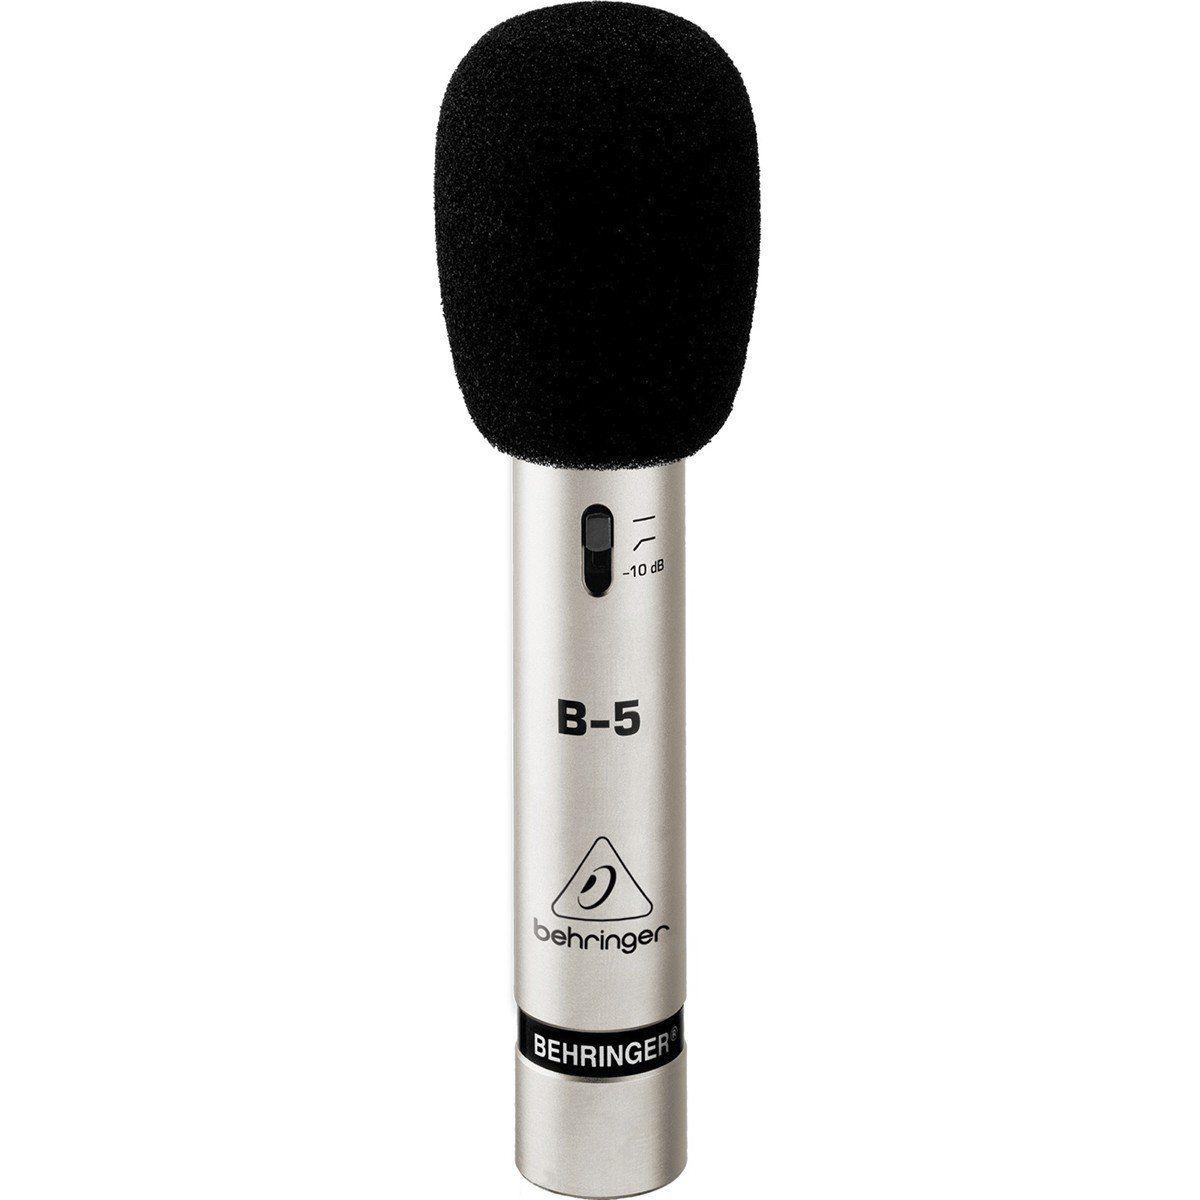 Behringer B5 Microfone Condensador Behringer B-5 Profissional para Instrumentos